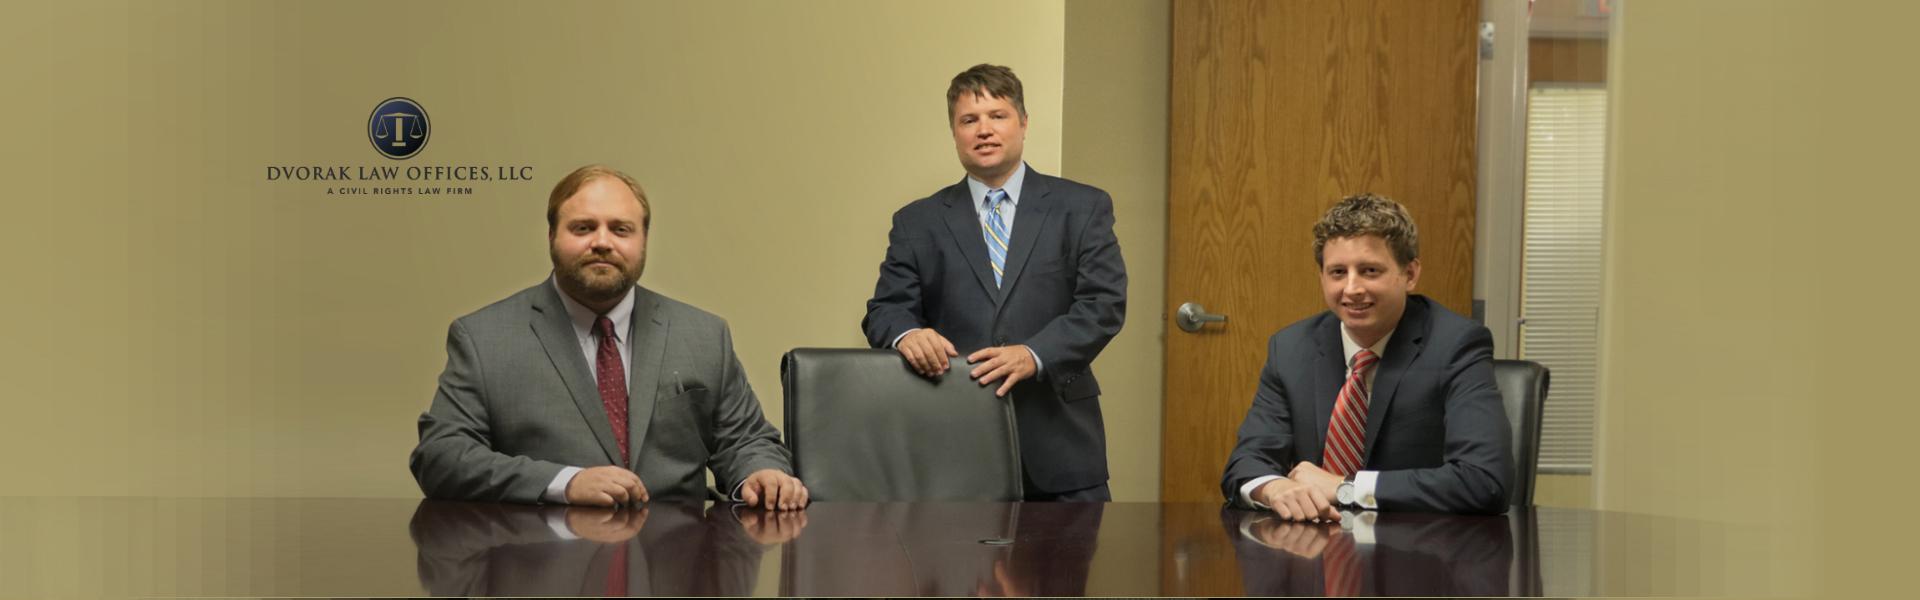 Dvorak-Law-Offices-attorney-profiles